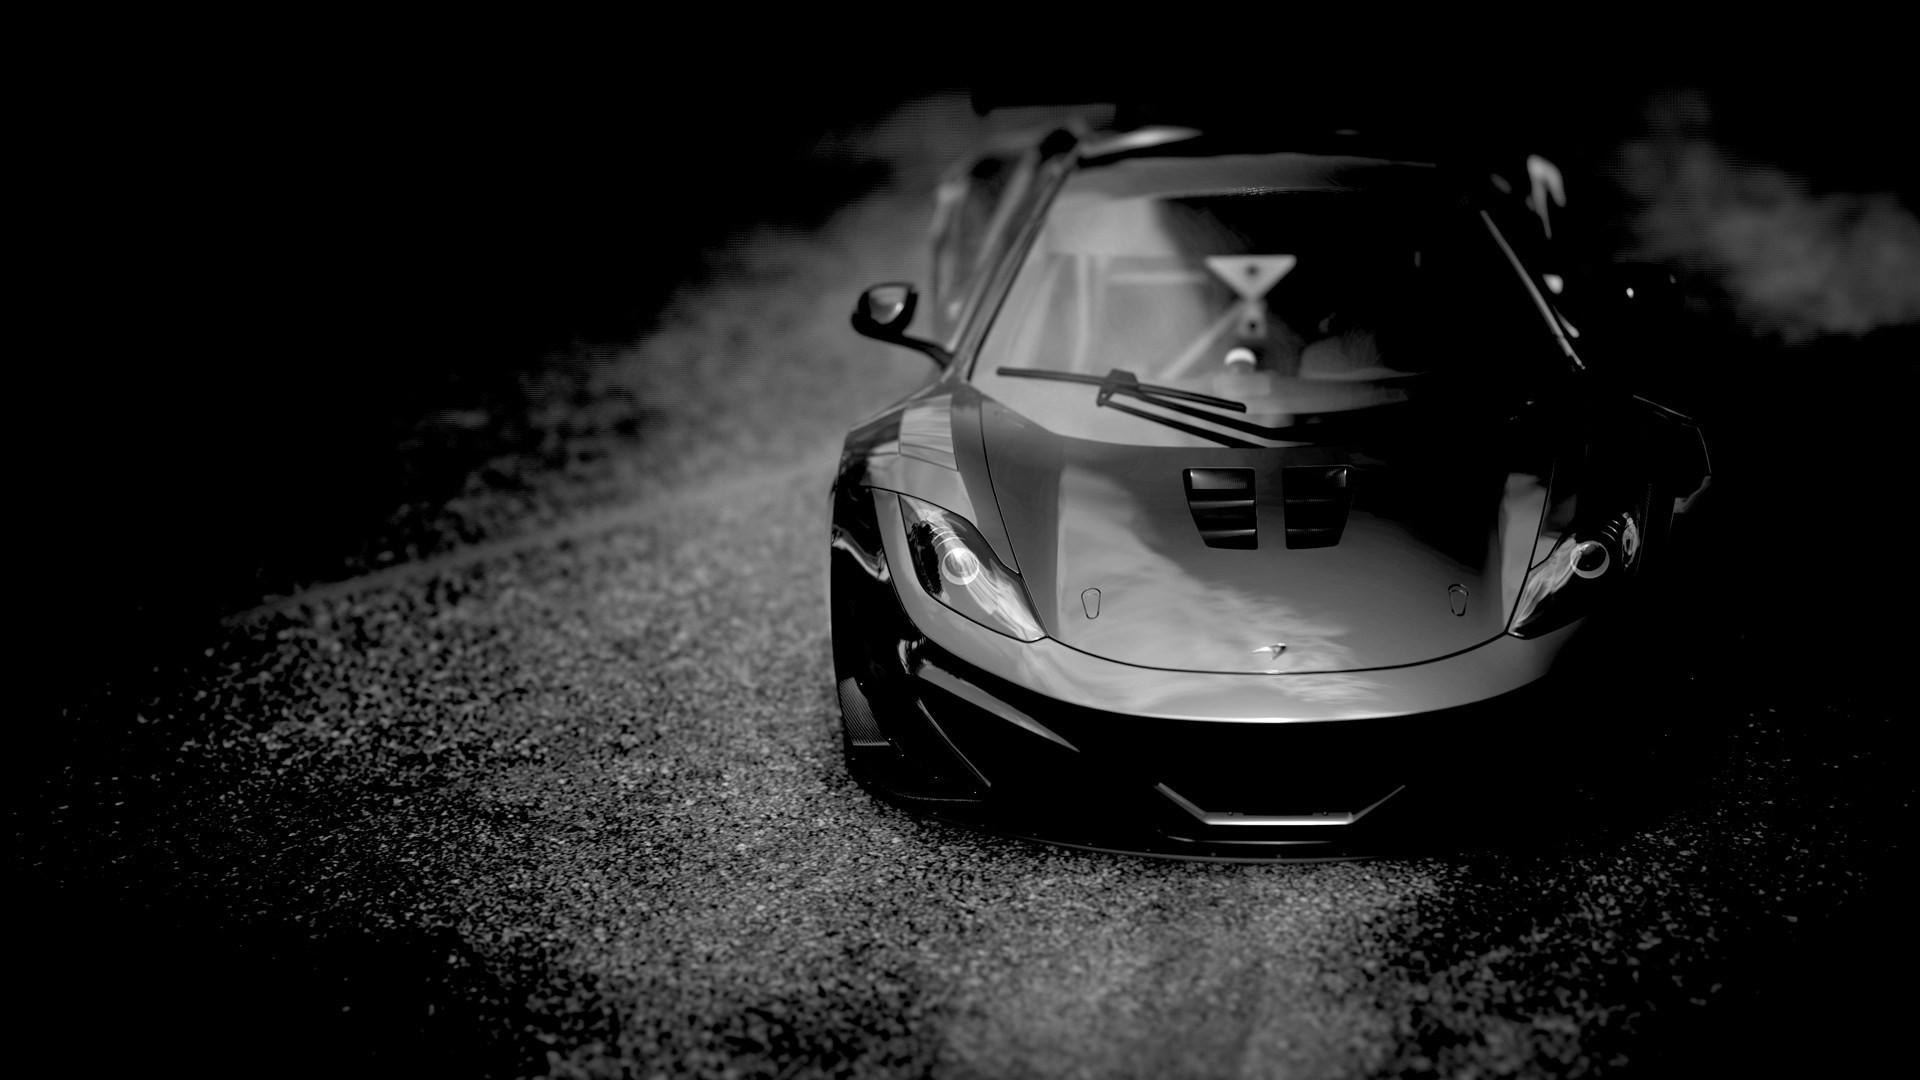 Black Sports Car Wallpaper: Wallpaper : Black Cars, Sports Car, McLaren MP4 12C, Wheel